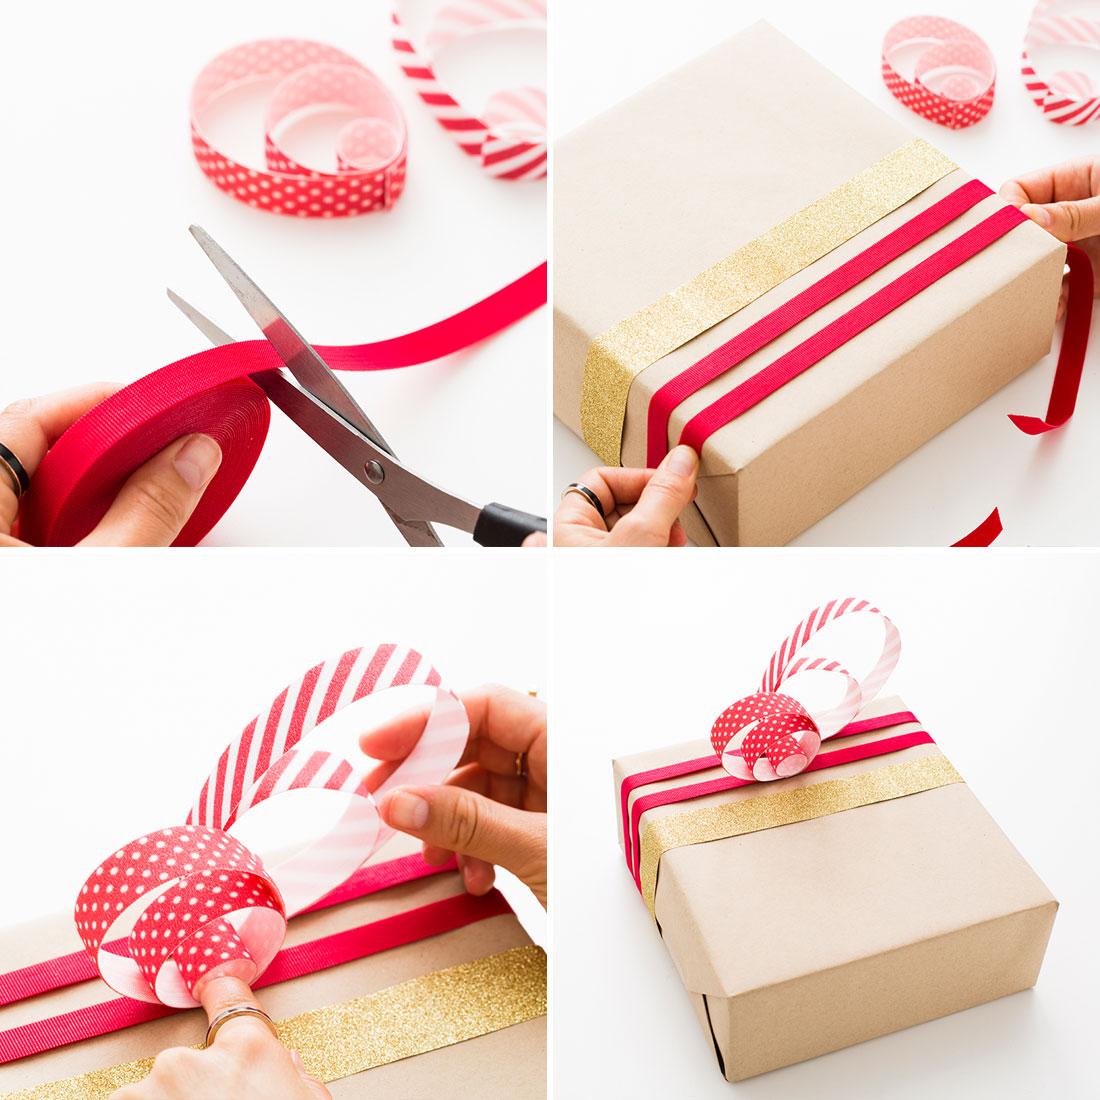 L'arte di impacchettare i regali fai da te: 12 idee creative